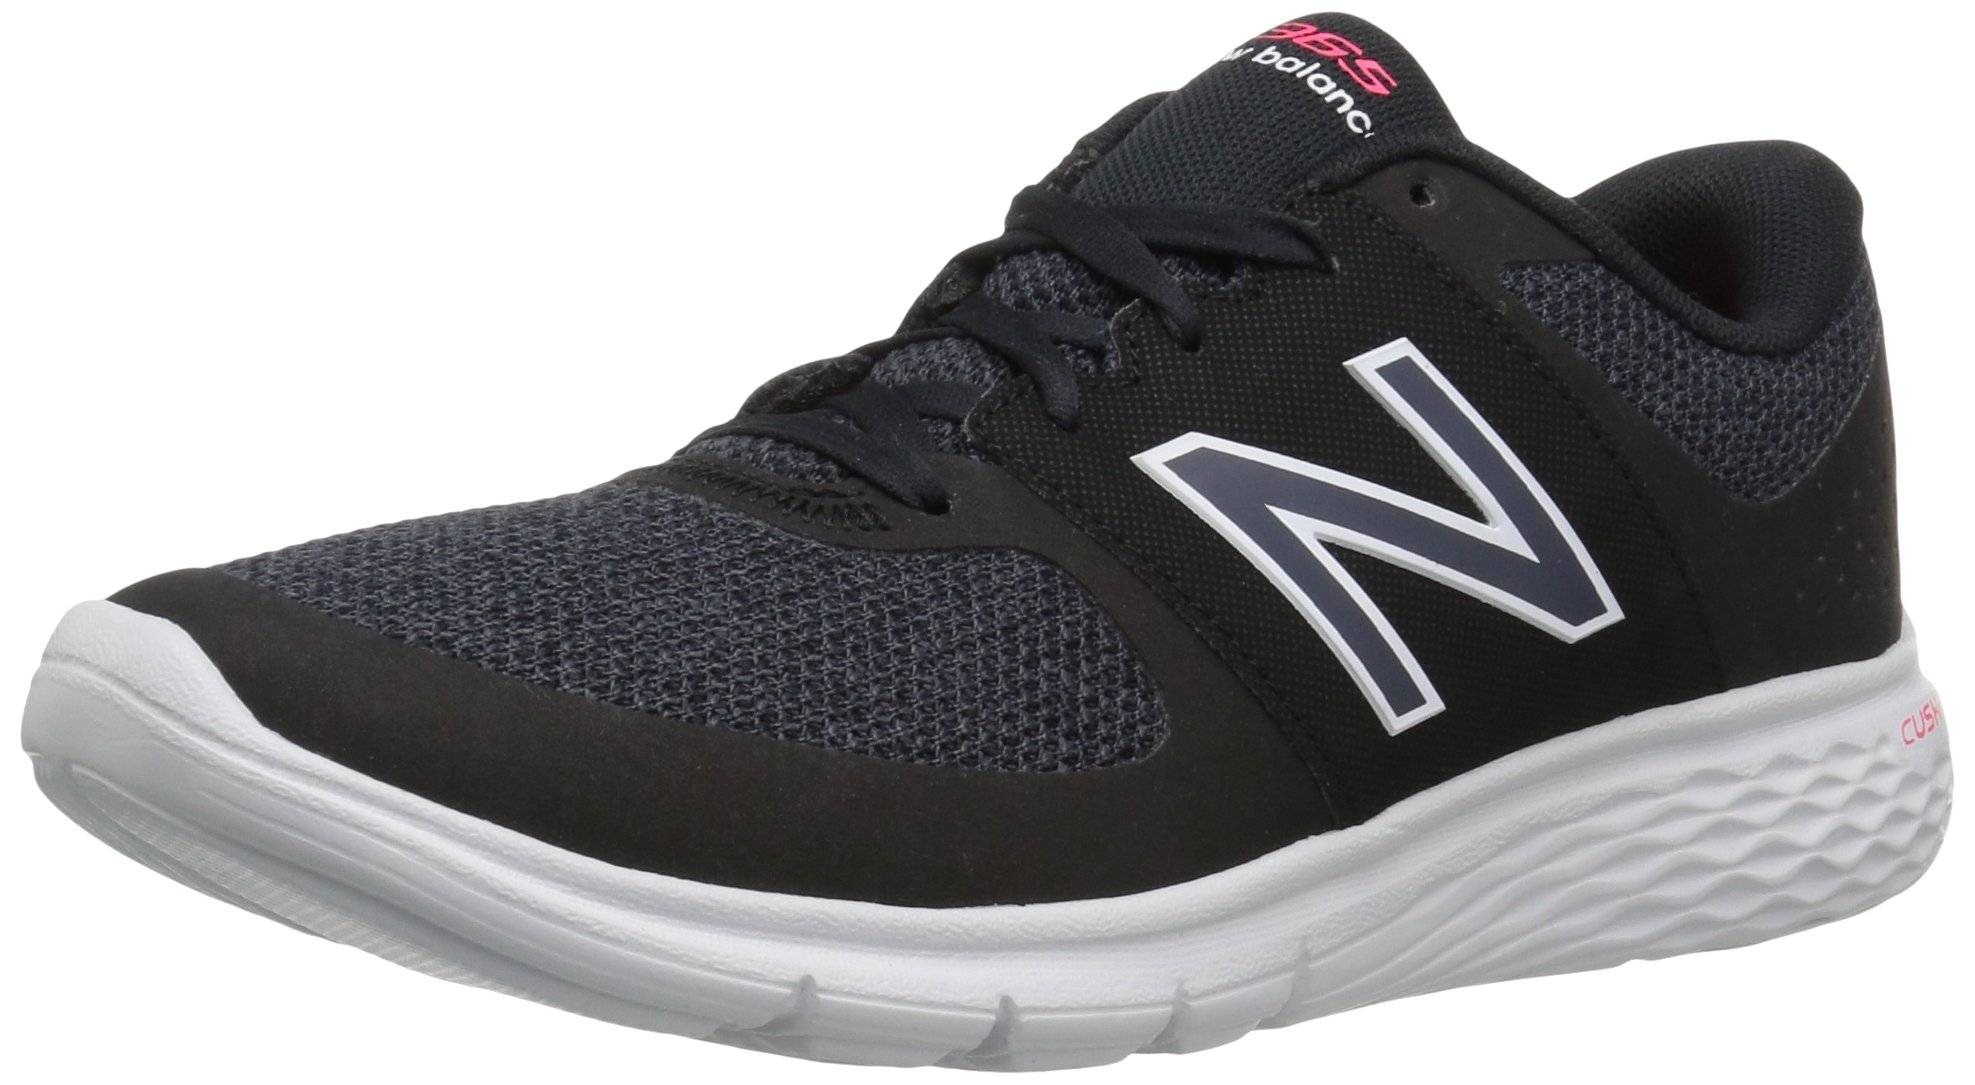 New Balance Women's WA365v1 CUSH + Walking Shoe, Black/White, 9.5 B US